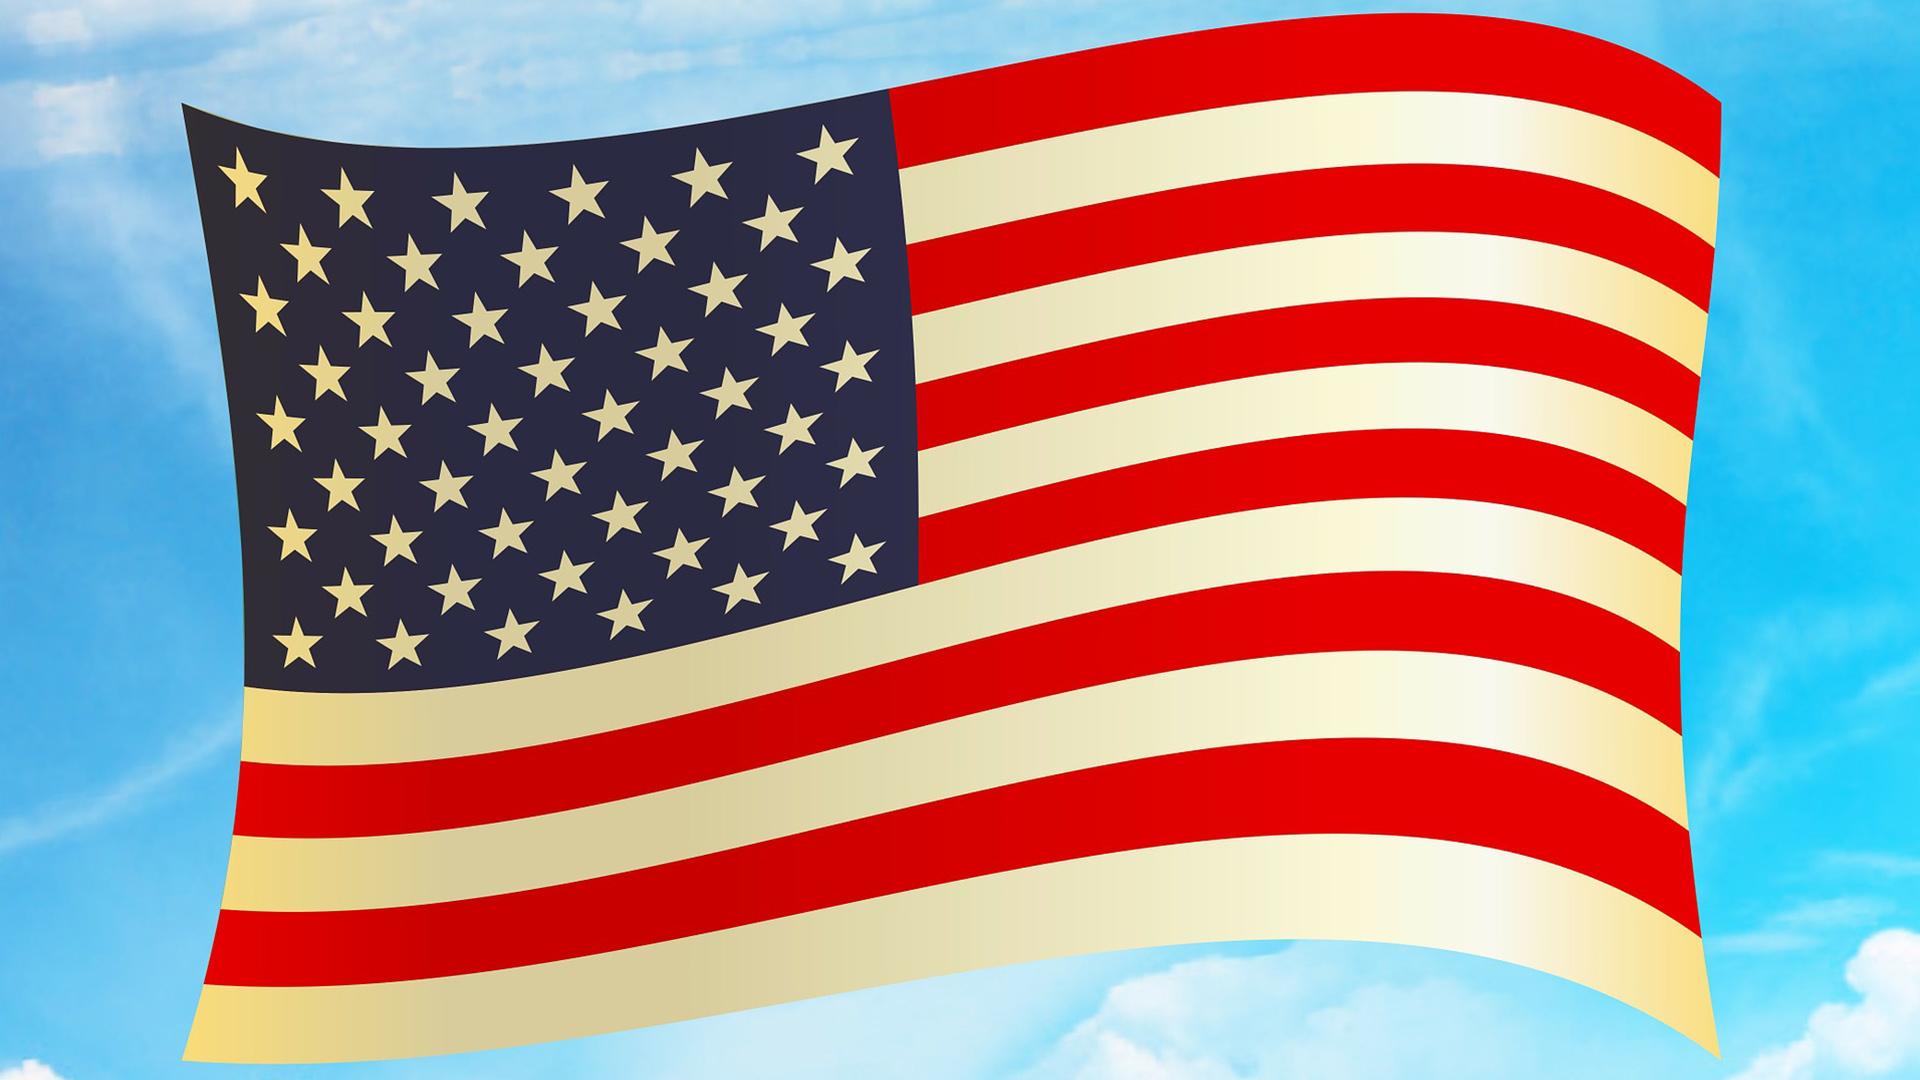 nova regra vistoamericano